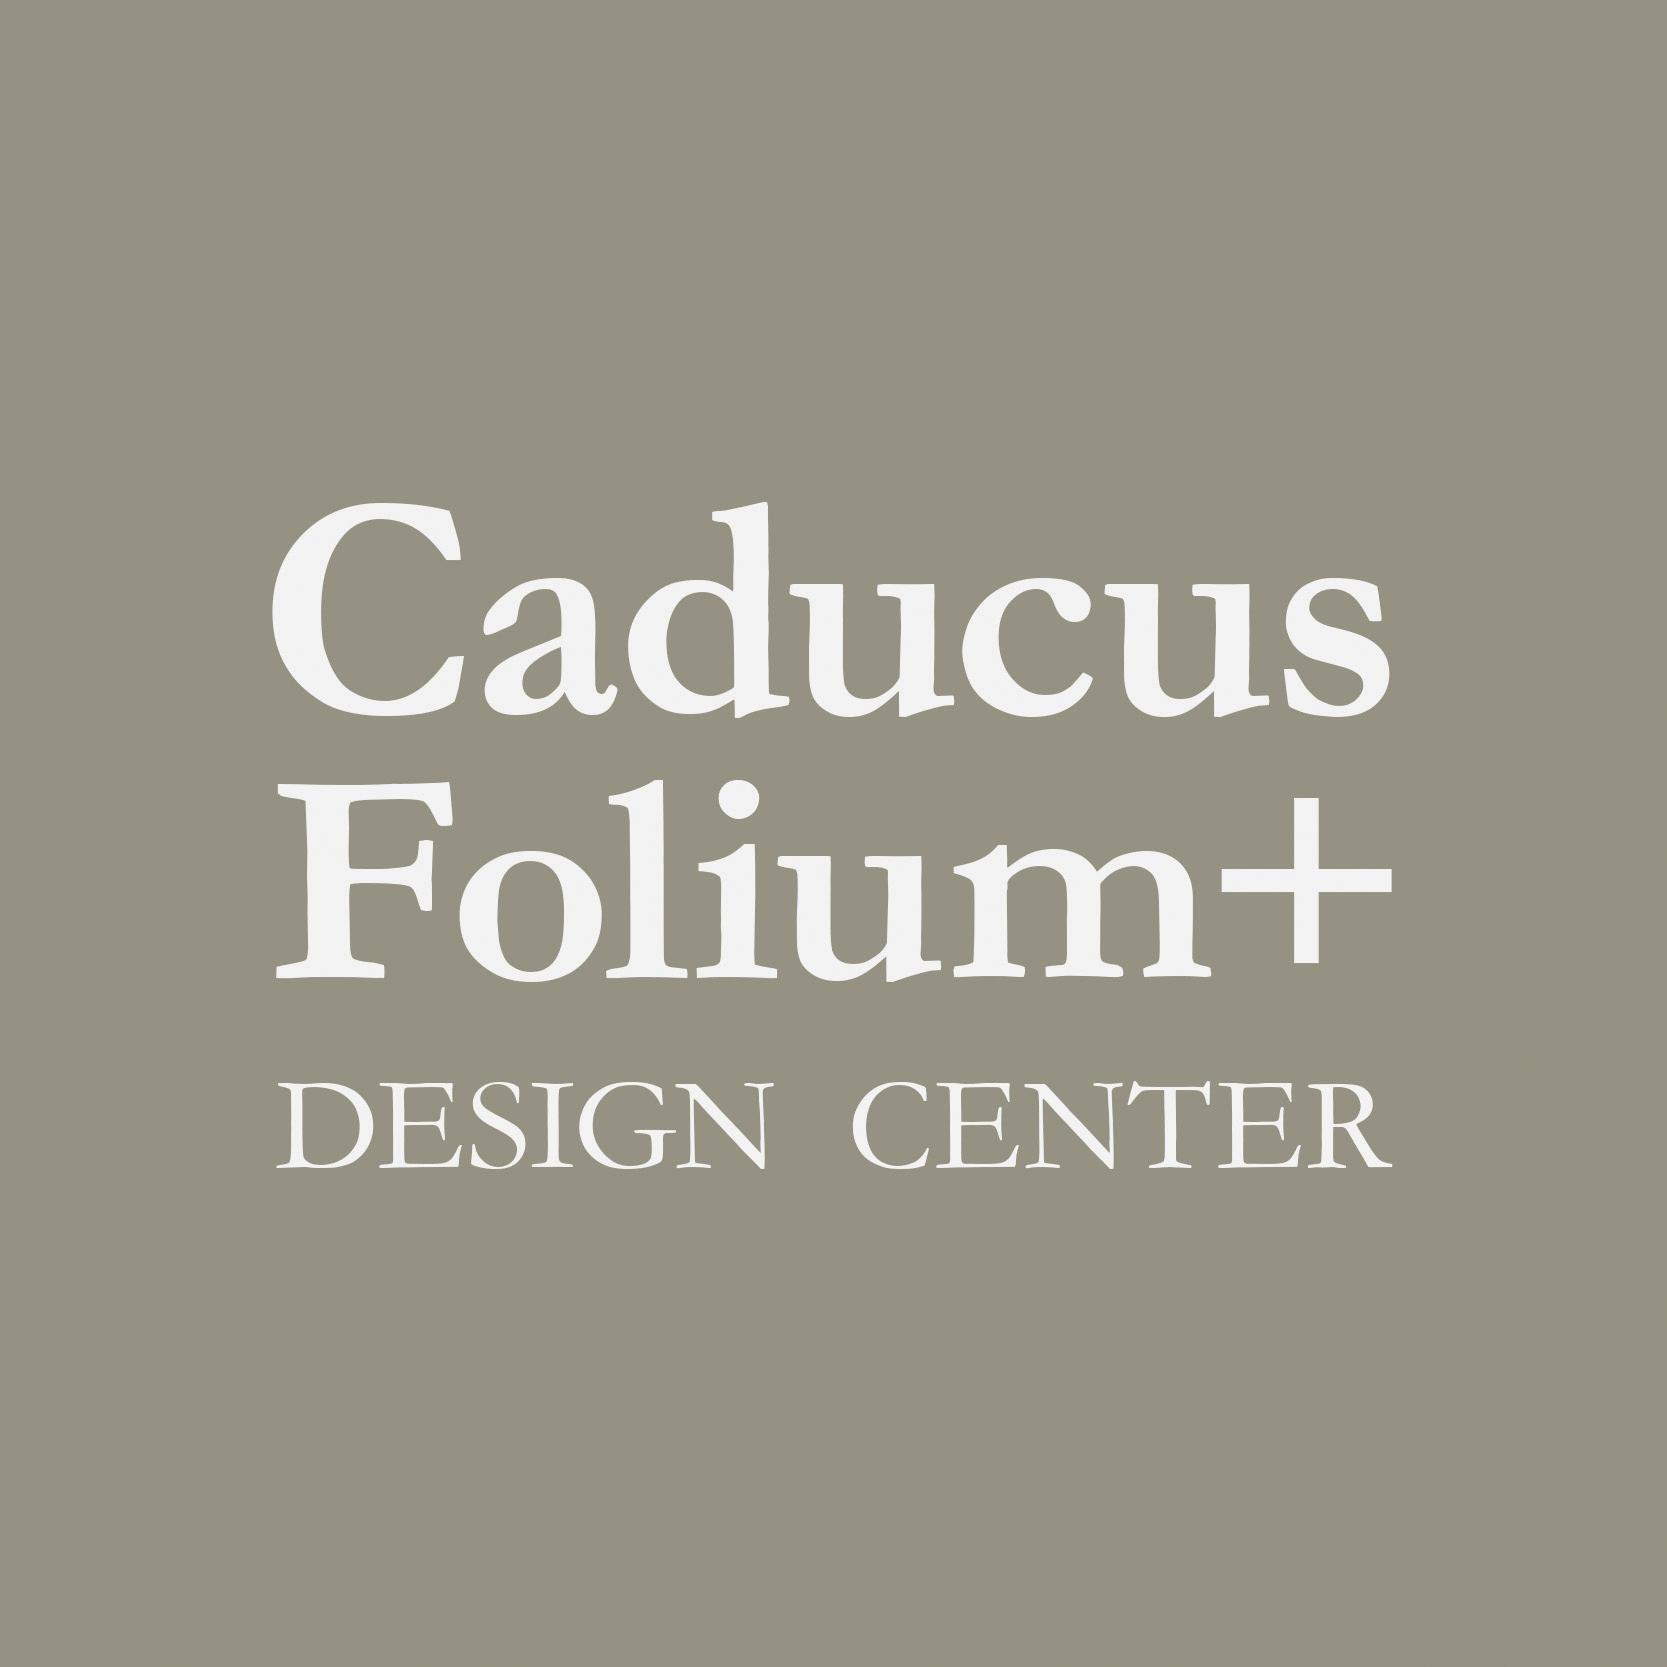 Caducus Folium- Especial Decoración - Revista CLAVE!